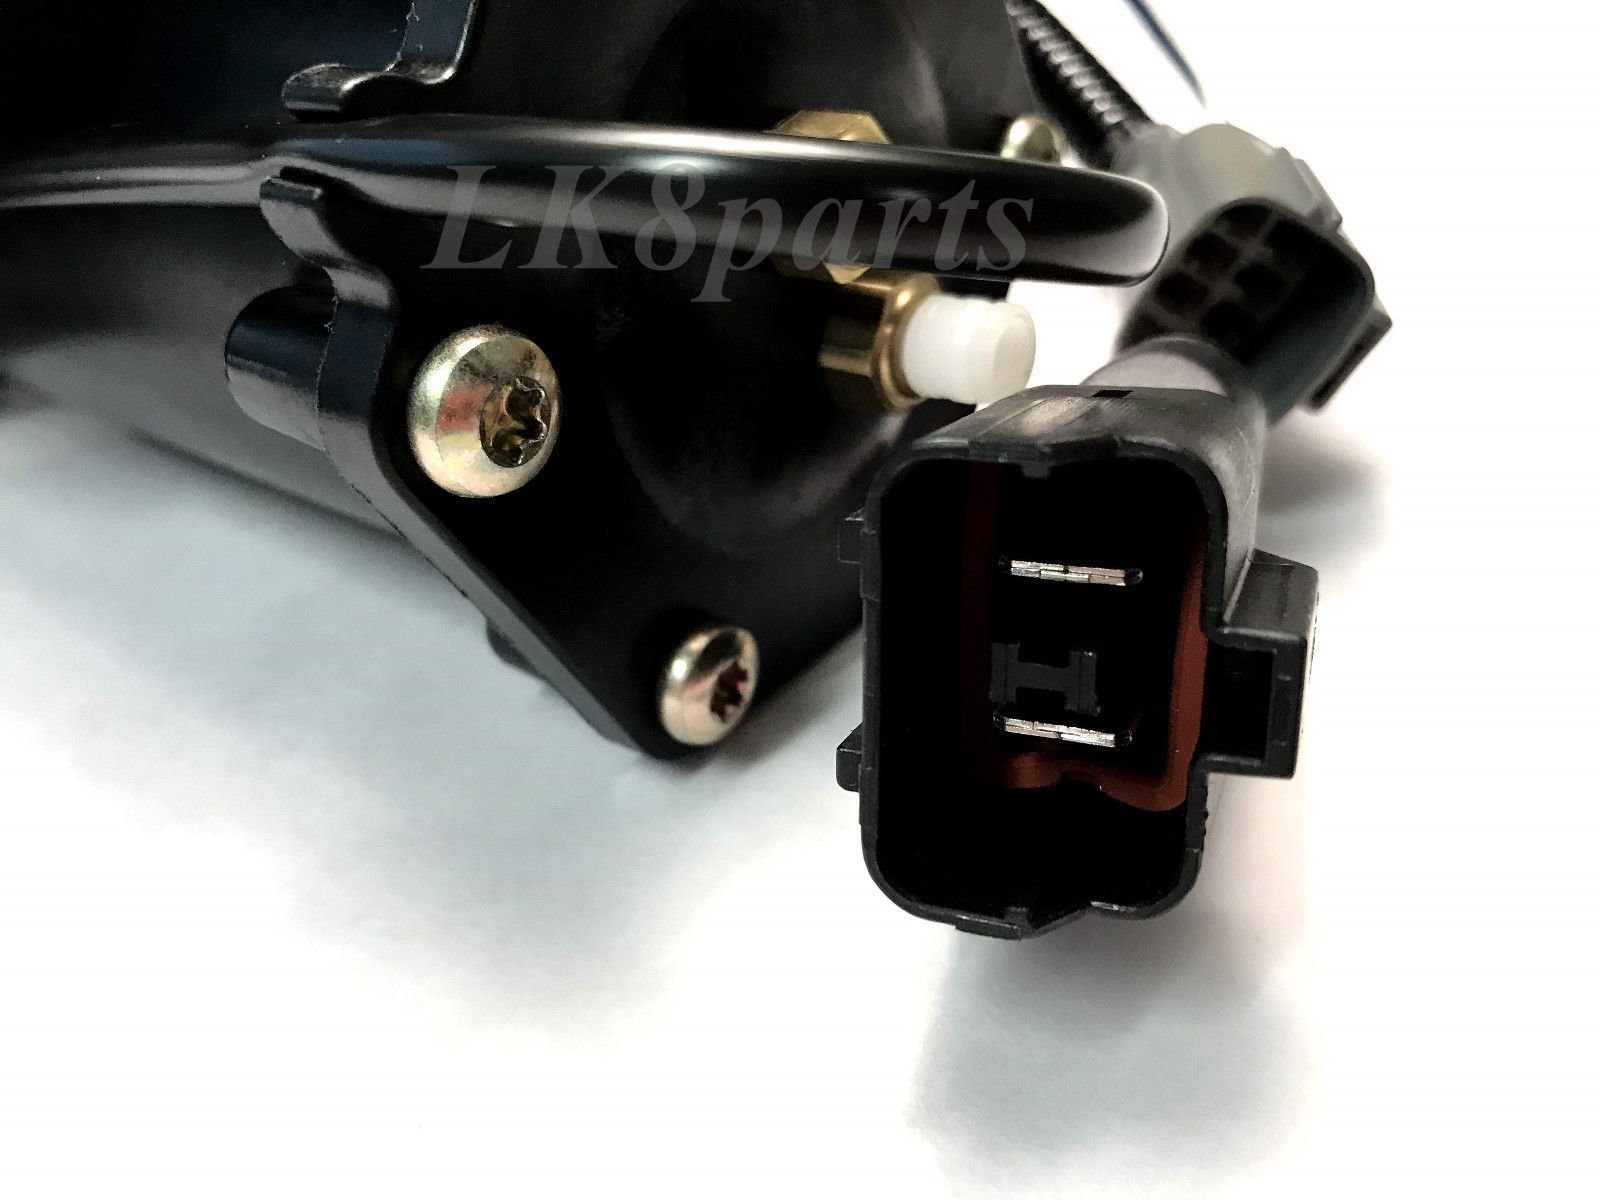 Land Rover Range Rover Sport LR3 HD Long Life Compressor Suspension Air Compressor by Proper Spec (Image #3)